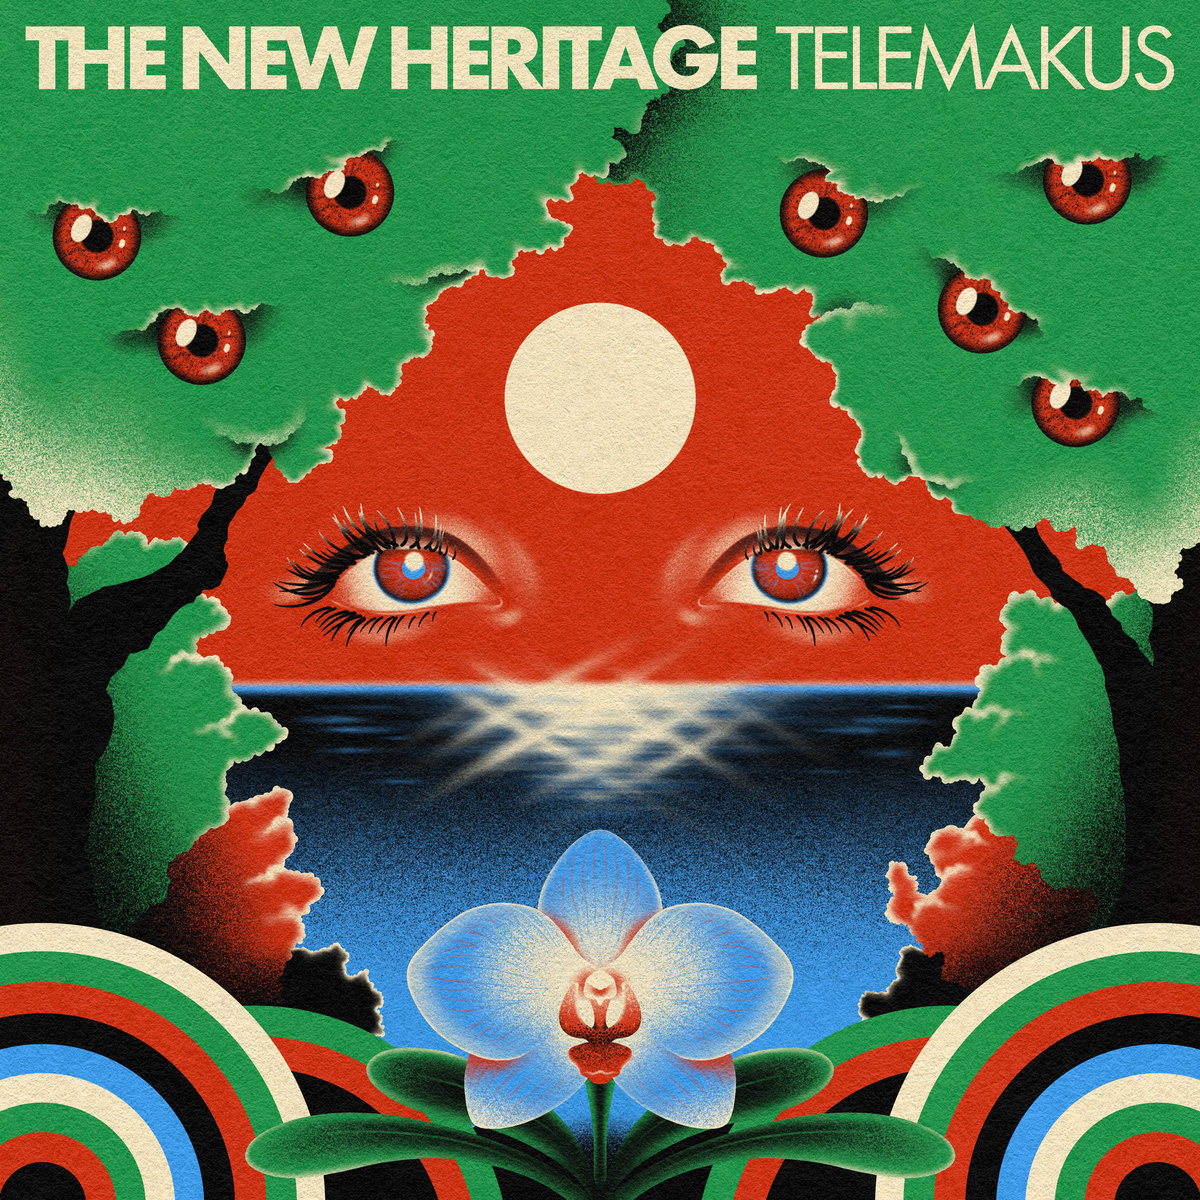 Telemakus | The New Heritage